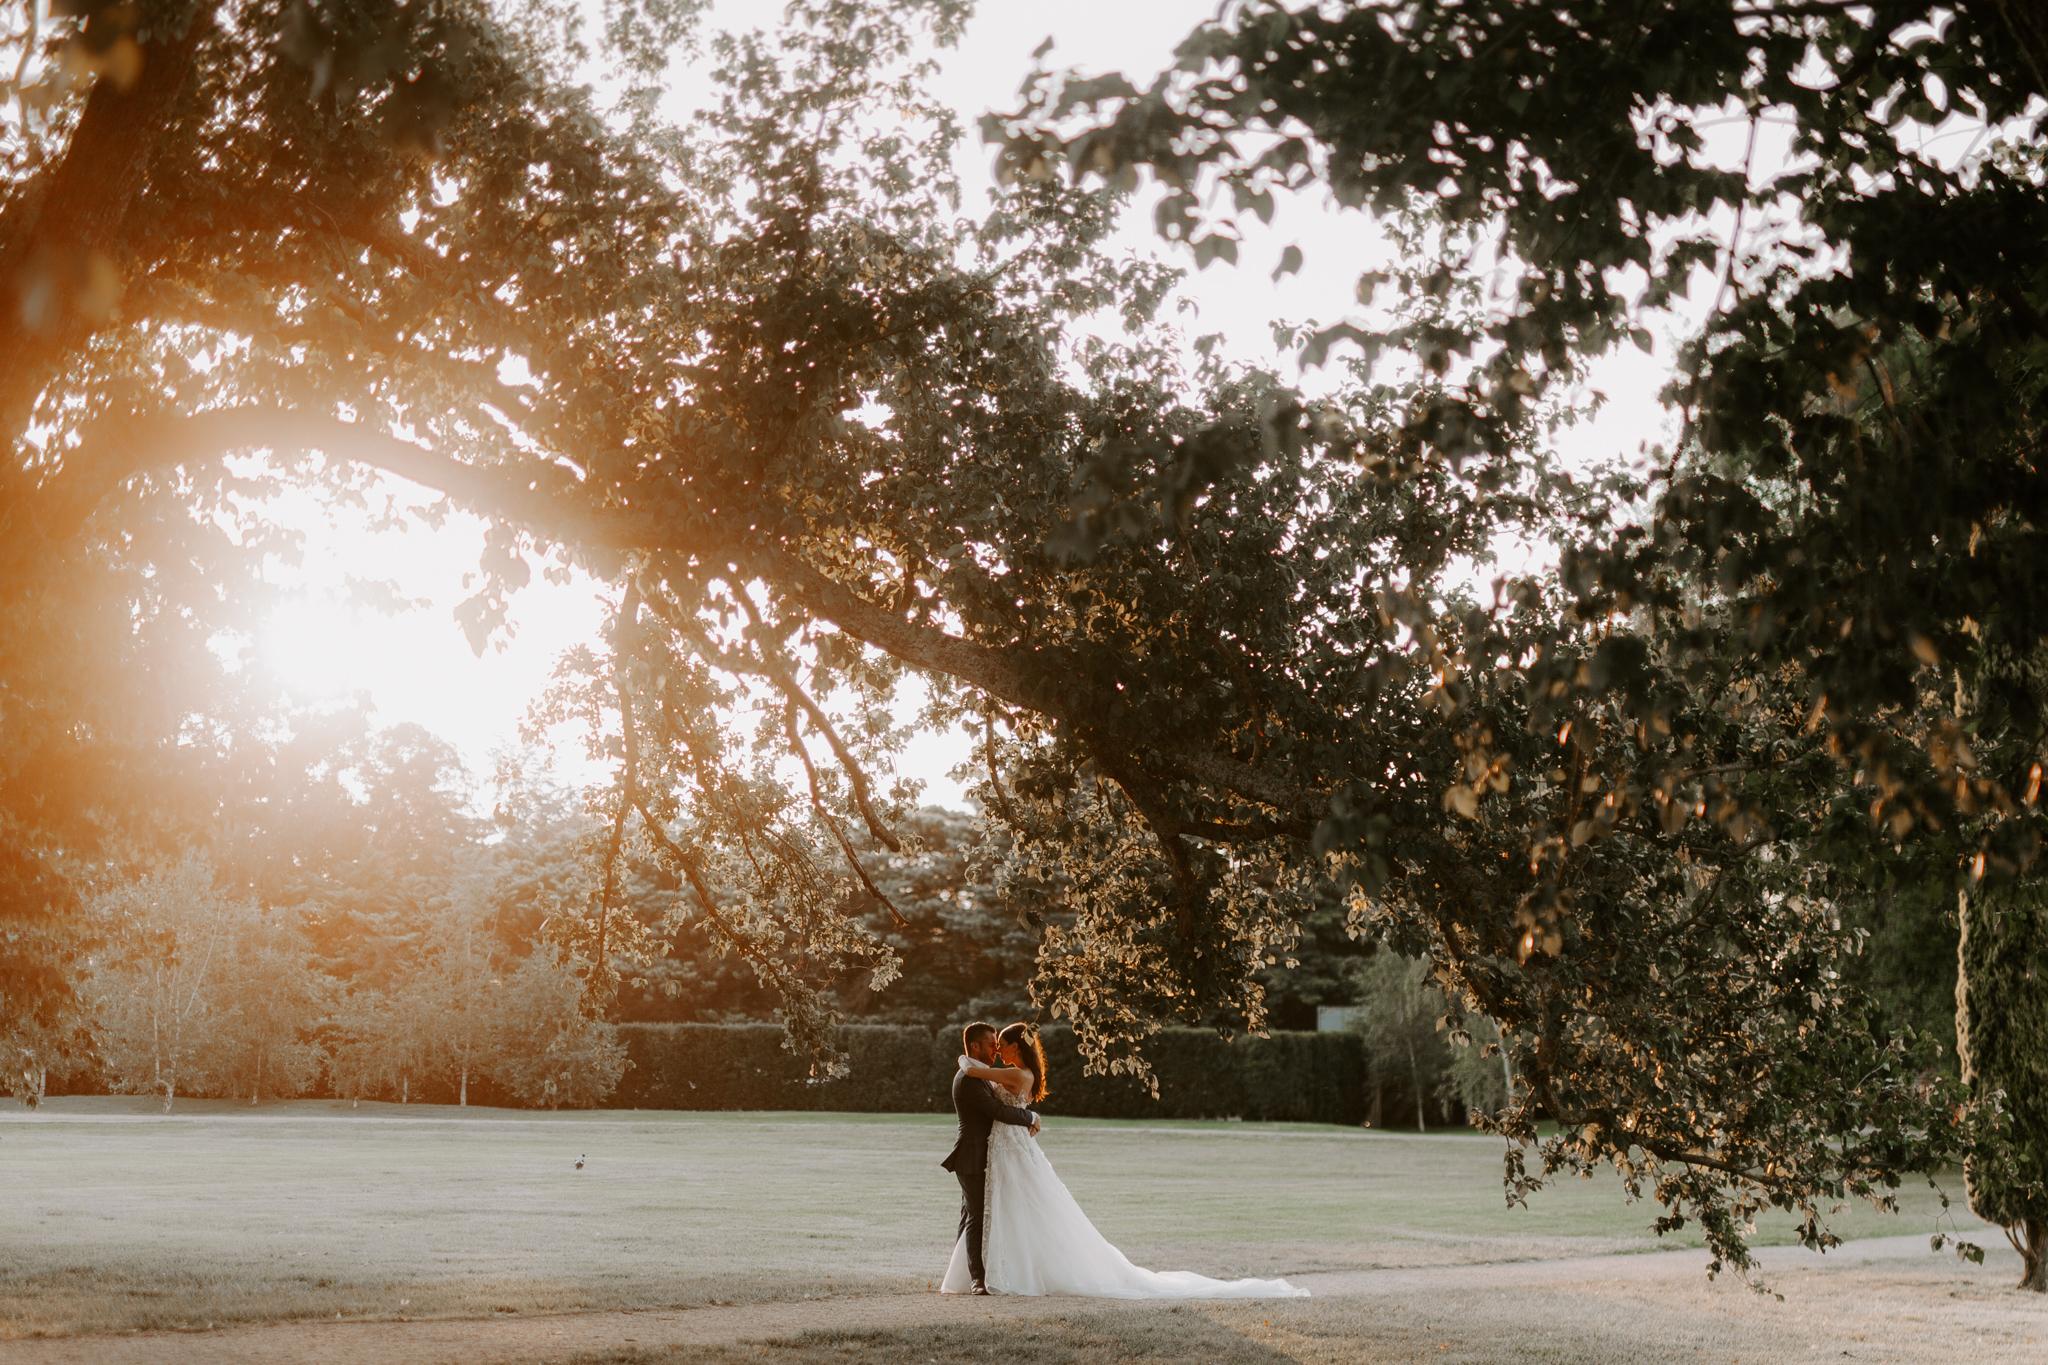 The-Stones-of-Yarra-Valley-Wedding-EmotionsandMathPhotography-201.jpg